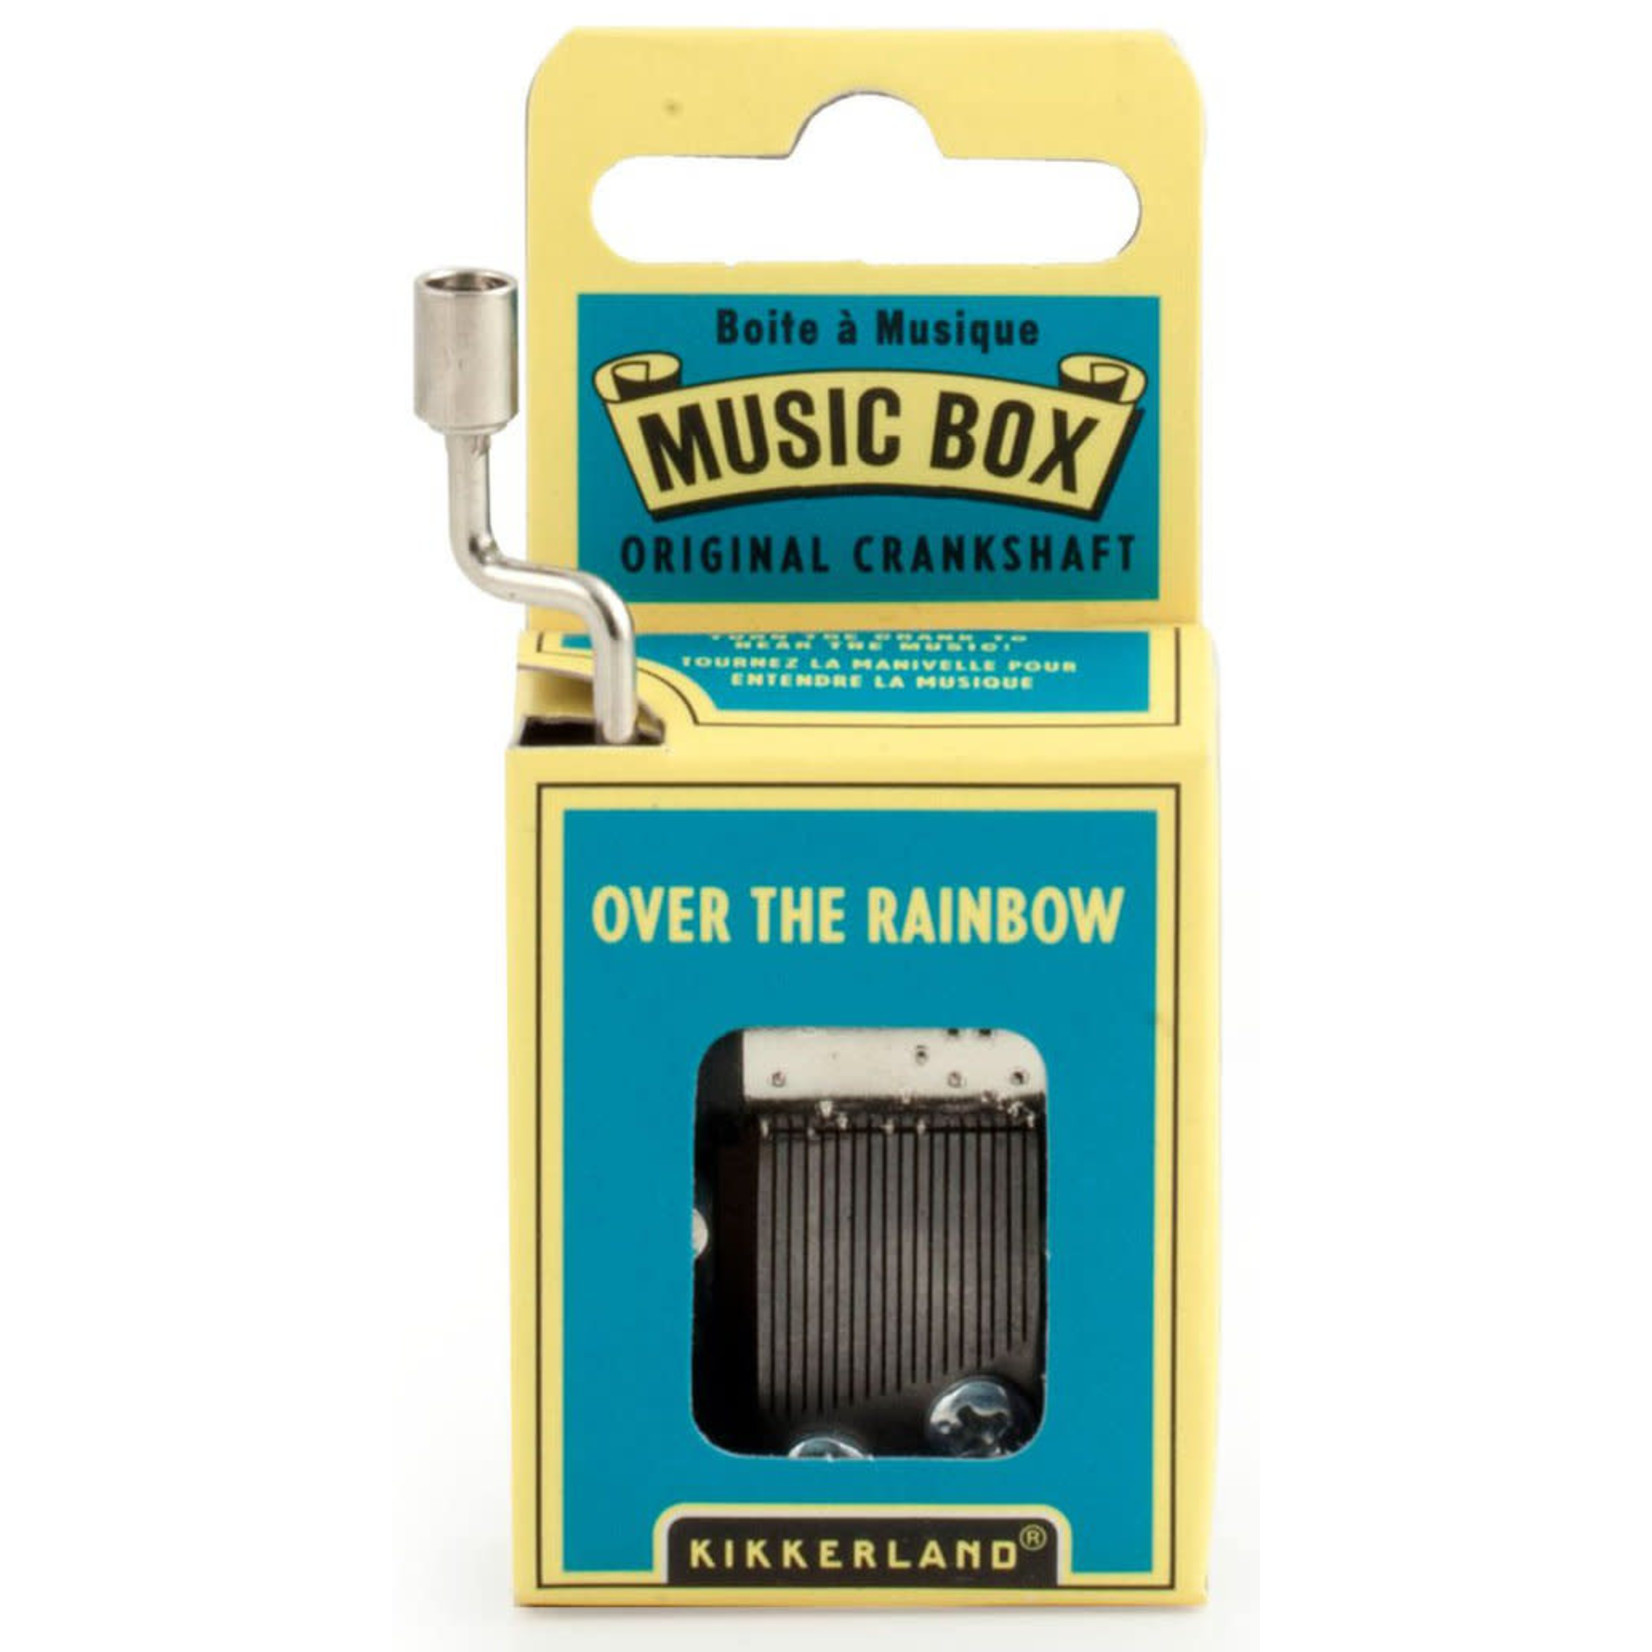 KIKKERLAND OVER THE RAINBOW MUSIC BOX